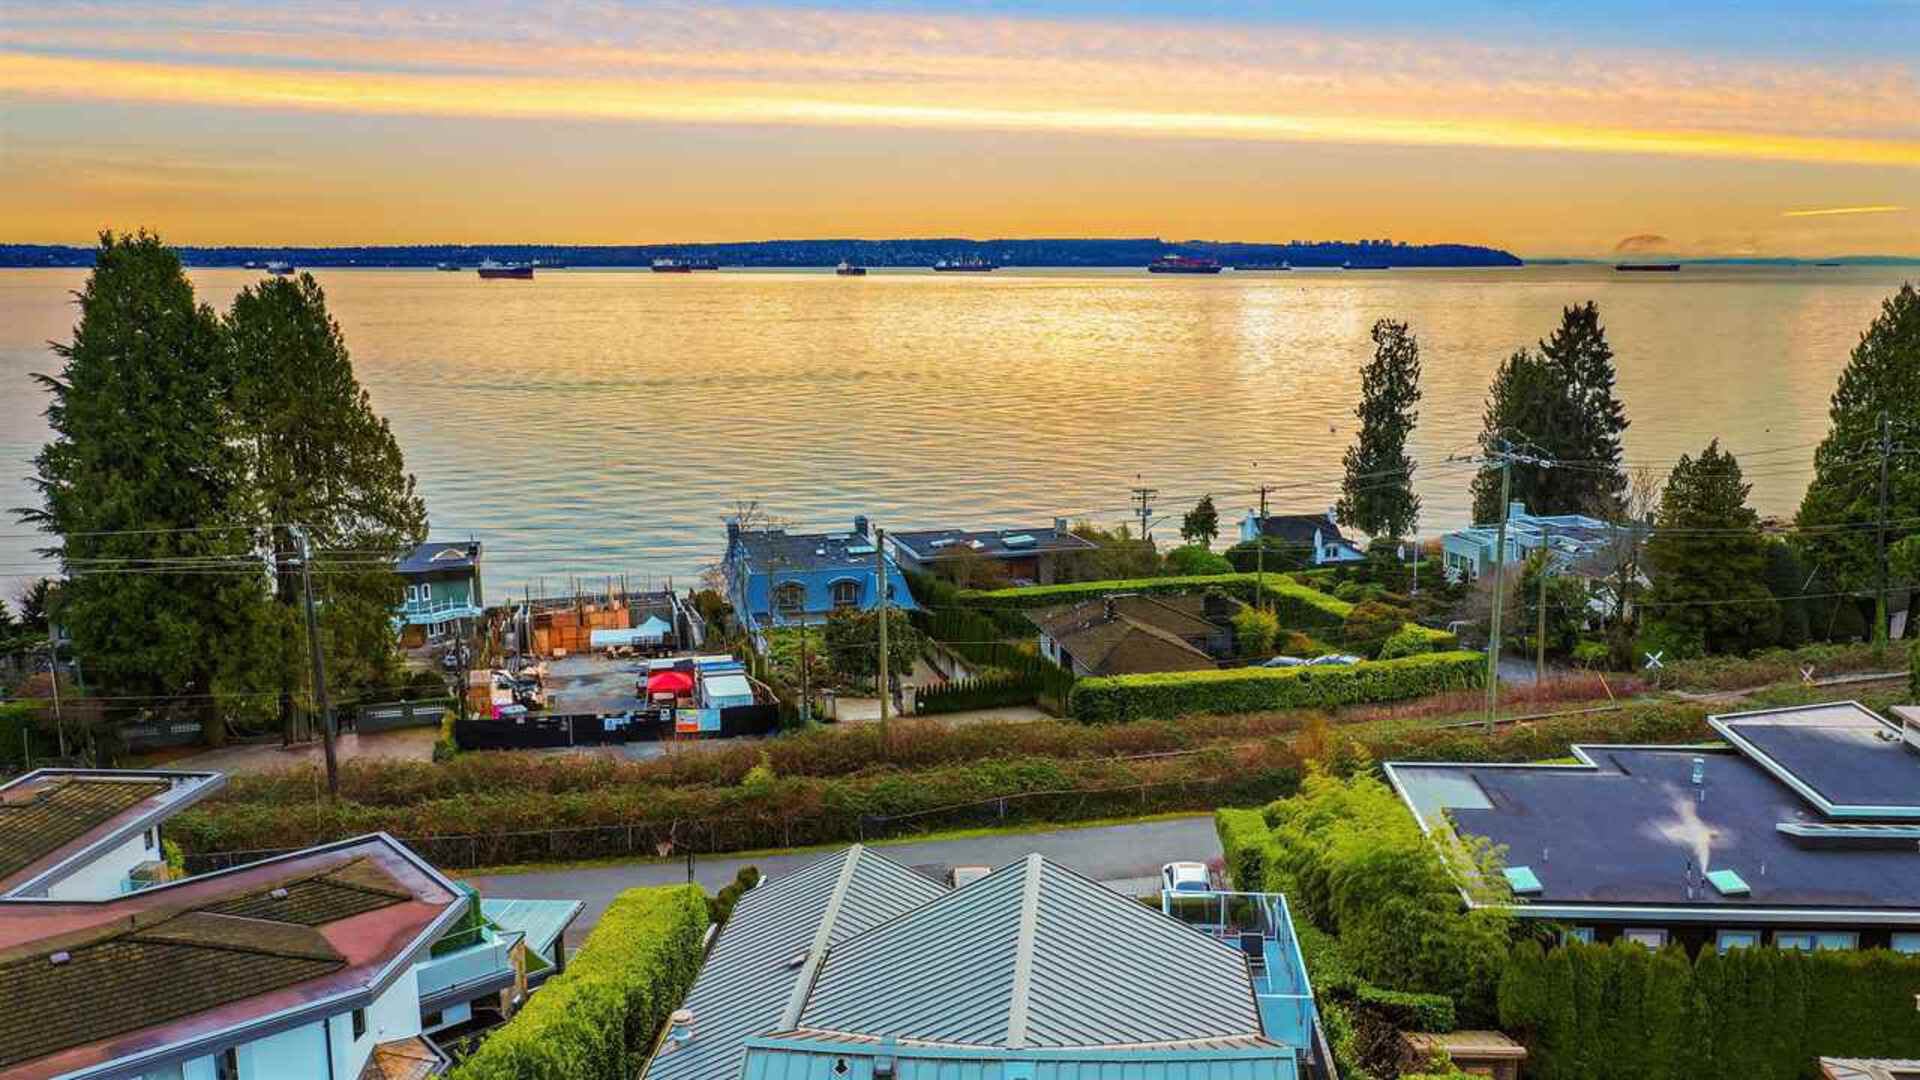 2771-bellevue-avenue-dundarave-west-vancouver-04 at 2771 Bellevue Avenue, Dundarave, West Vancouver